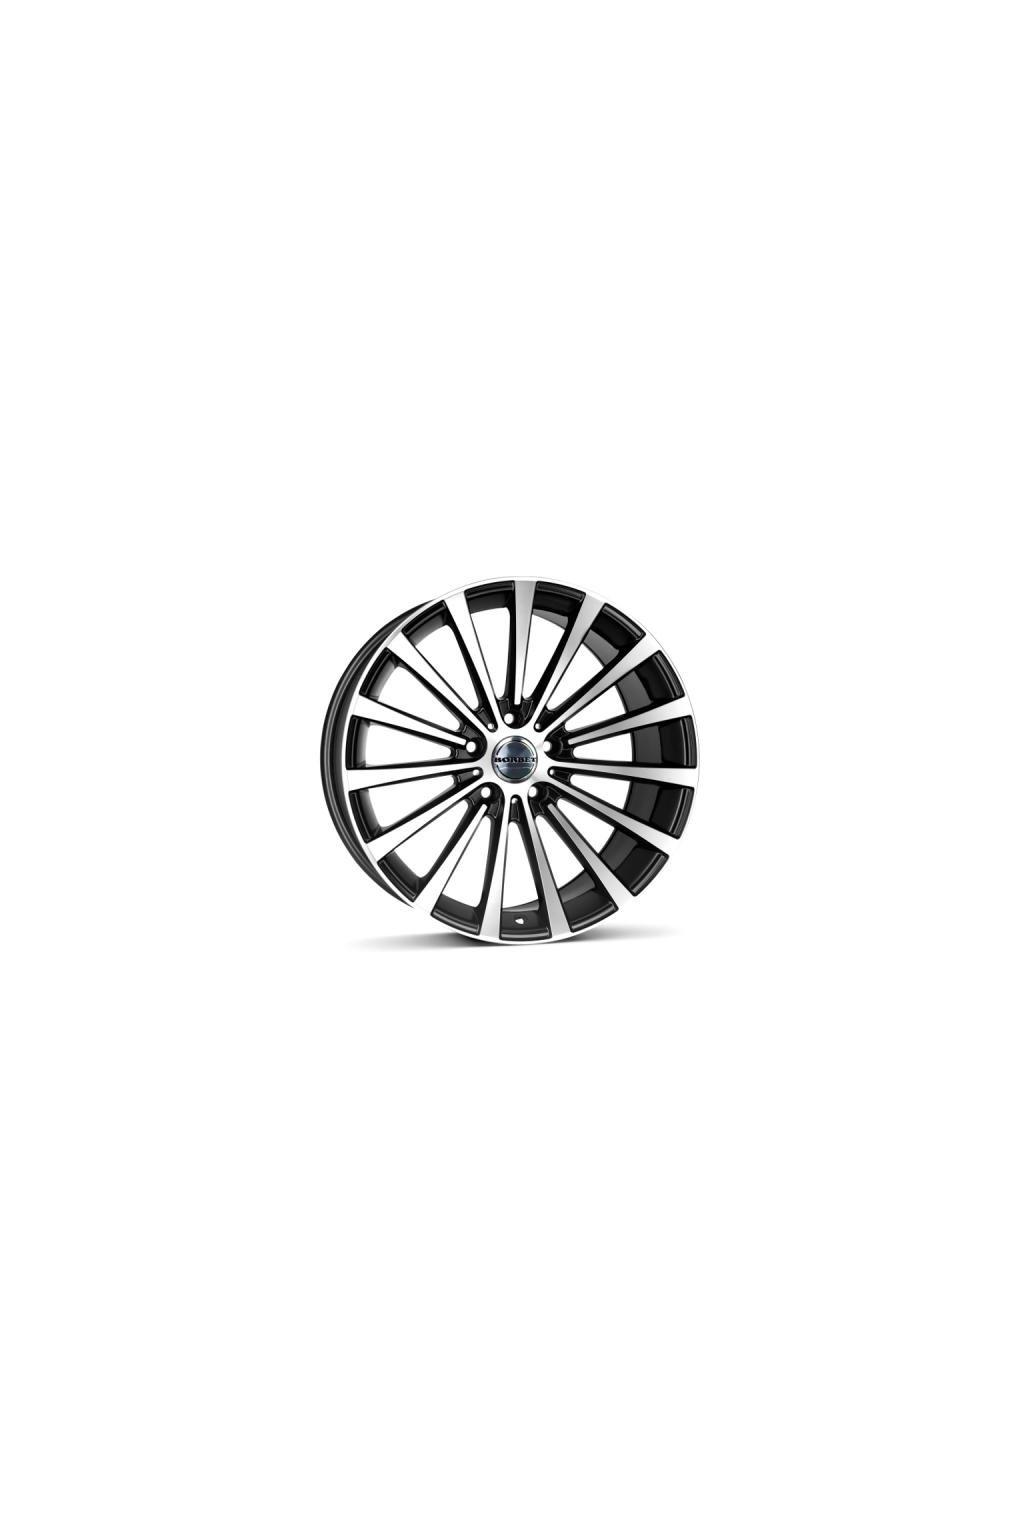 Disk Borbet BLX 8.5x19 ET45 5x112 cierno lesteny matny